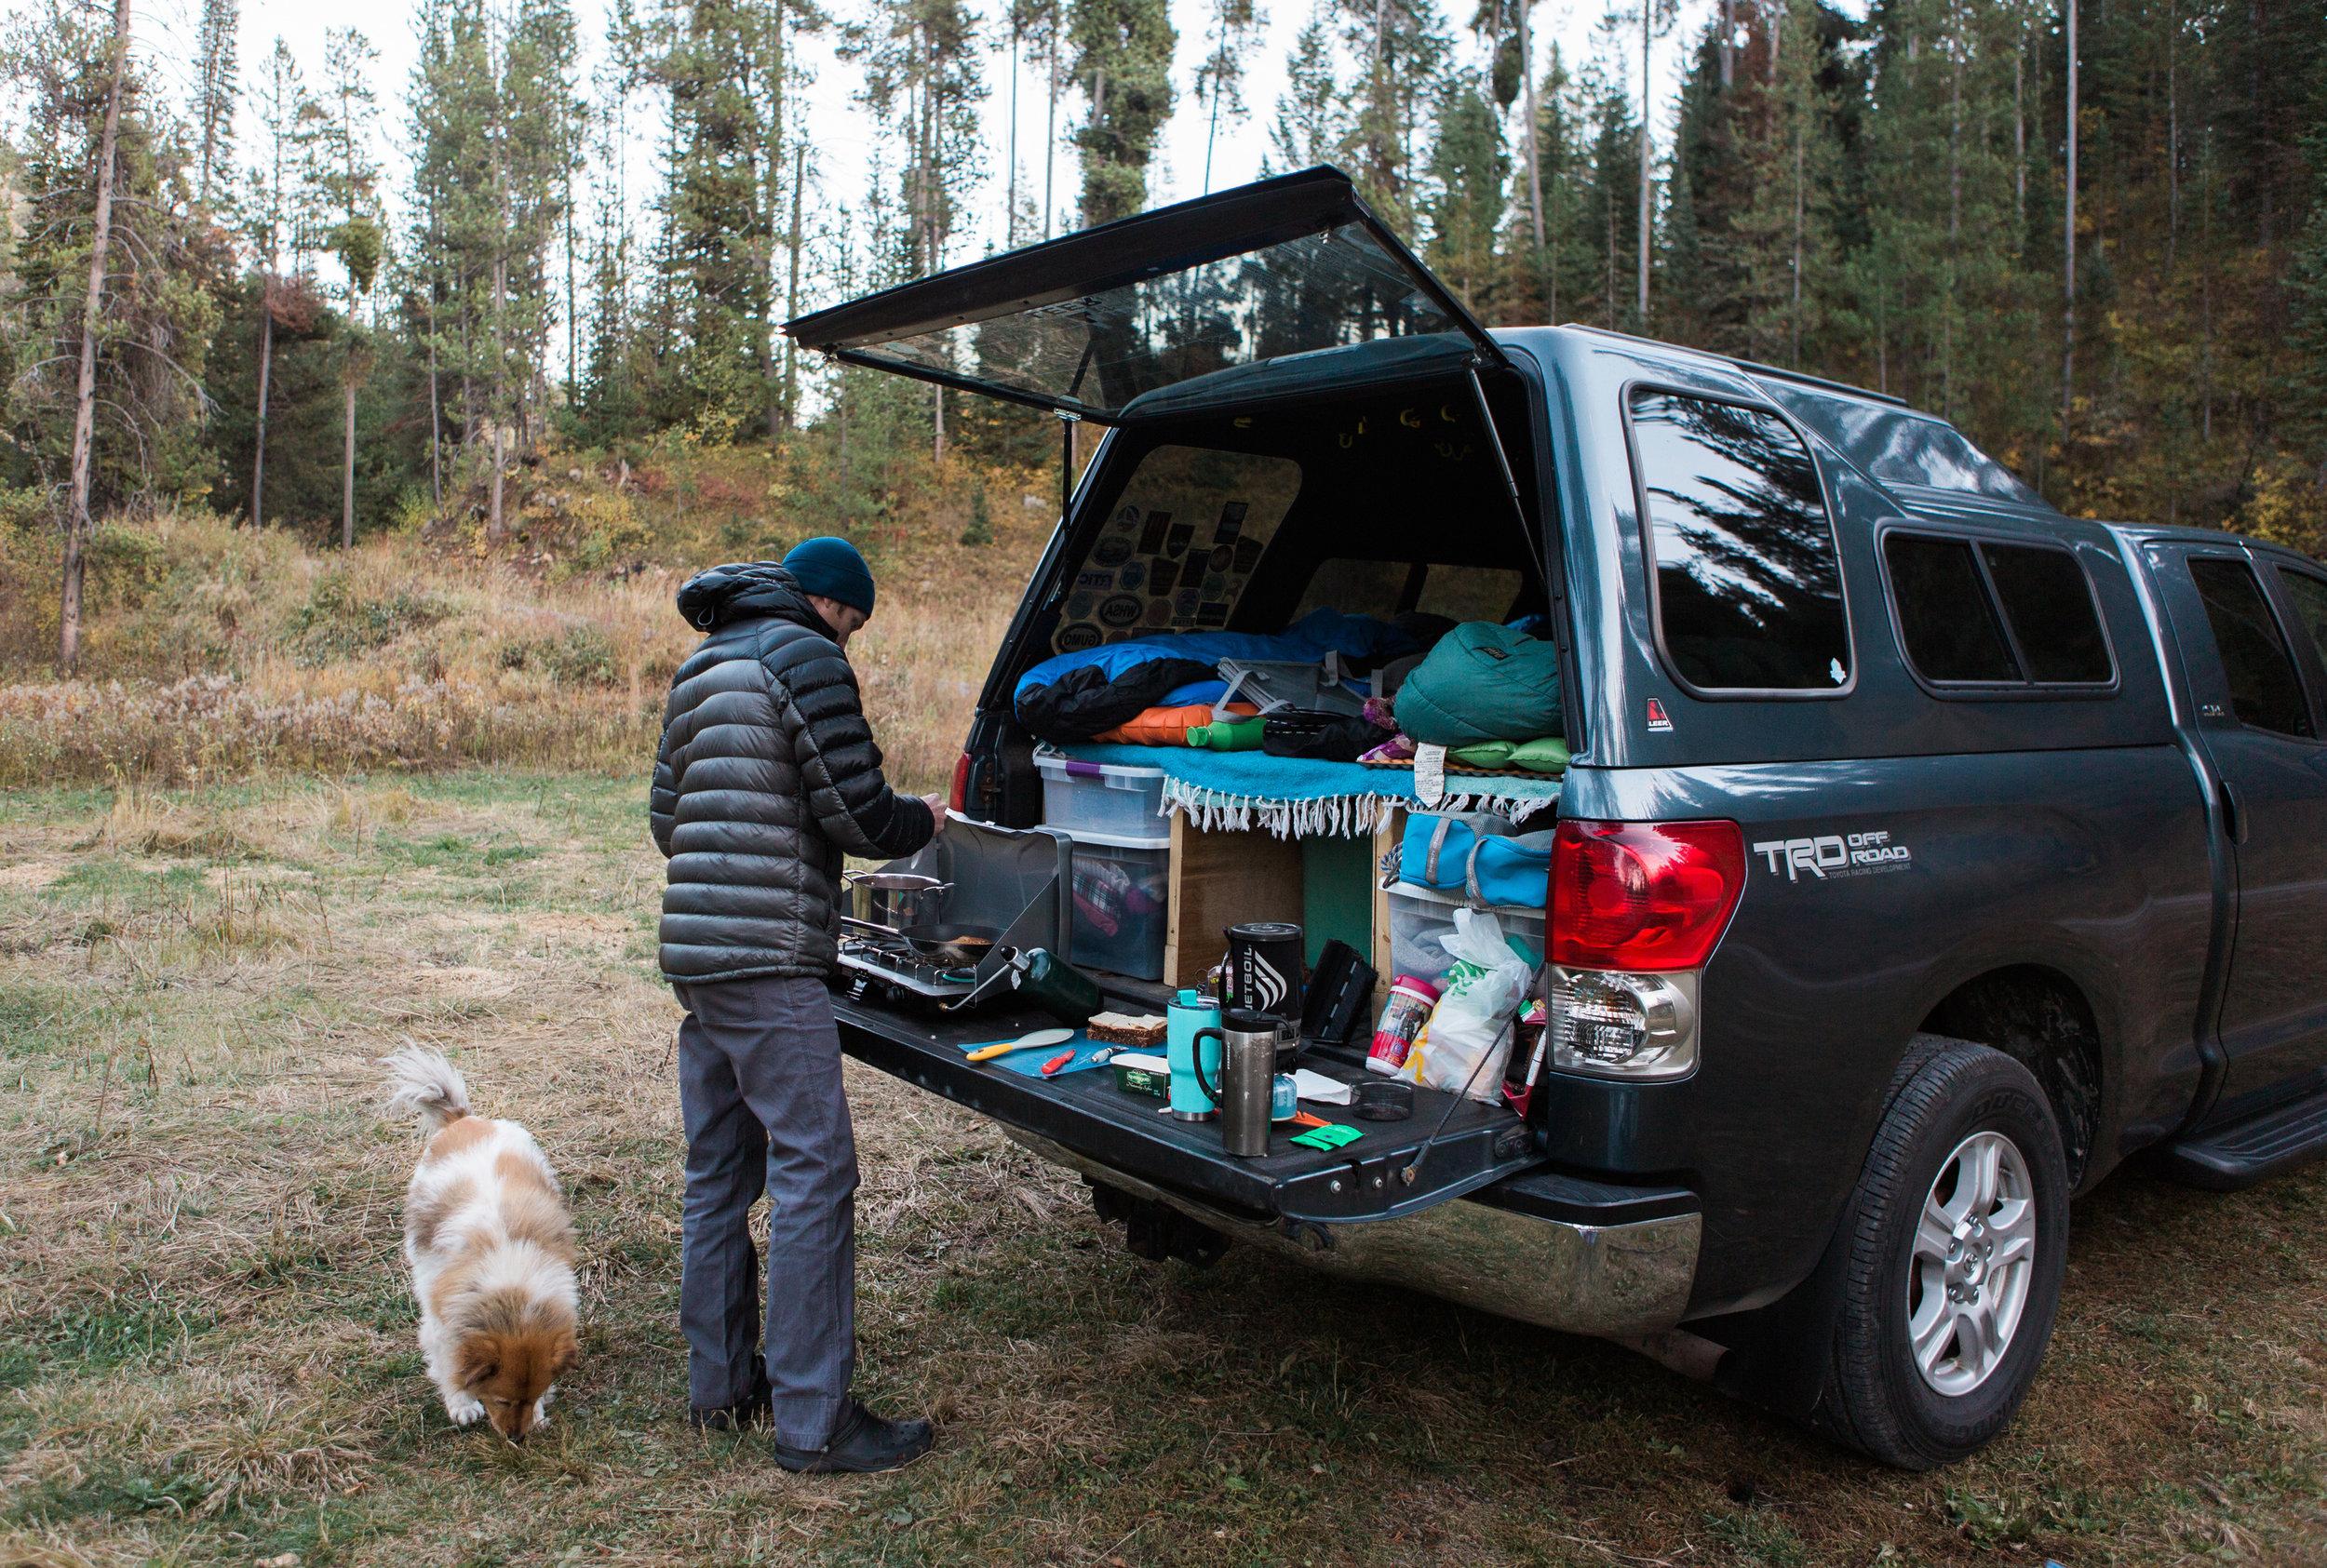 Cindy_Giovagnoli_Idaho_Wyoming_Grand_Teton_National_Park_autumn_aspens_camping_mountains-027.jpg